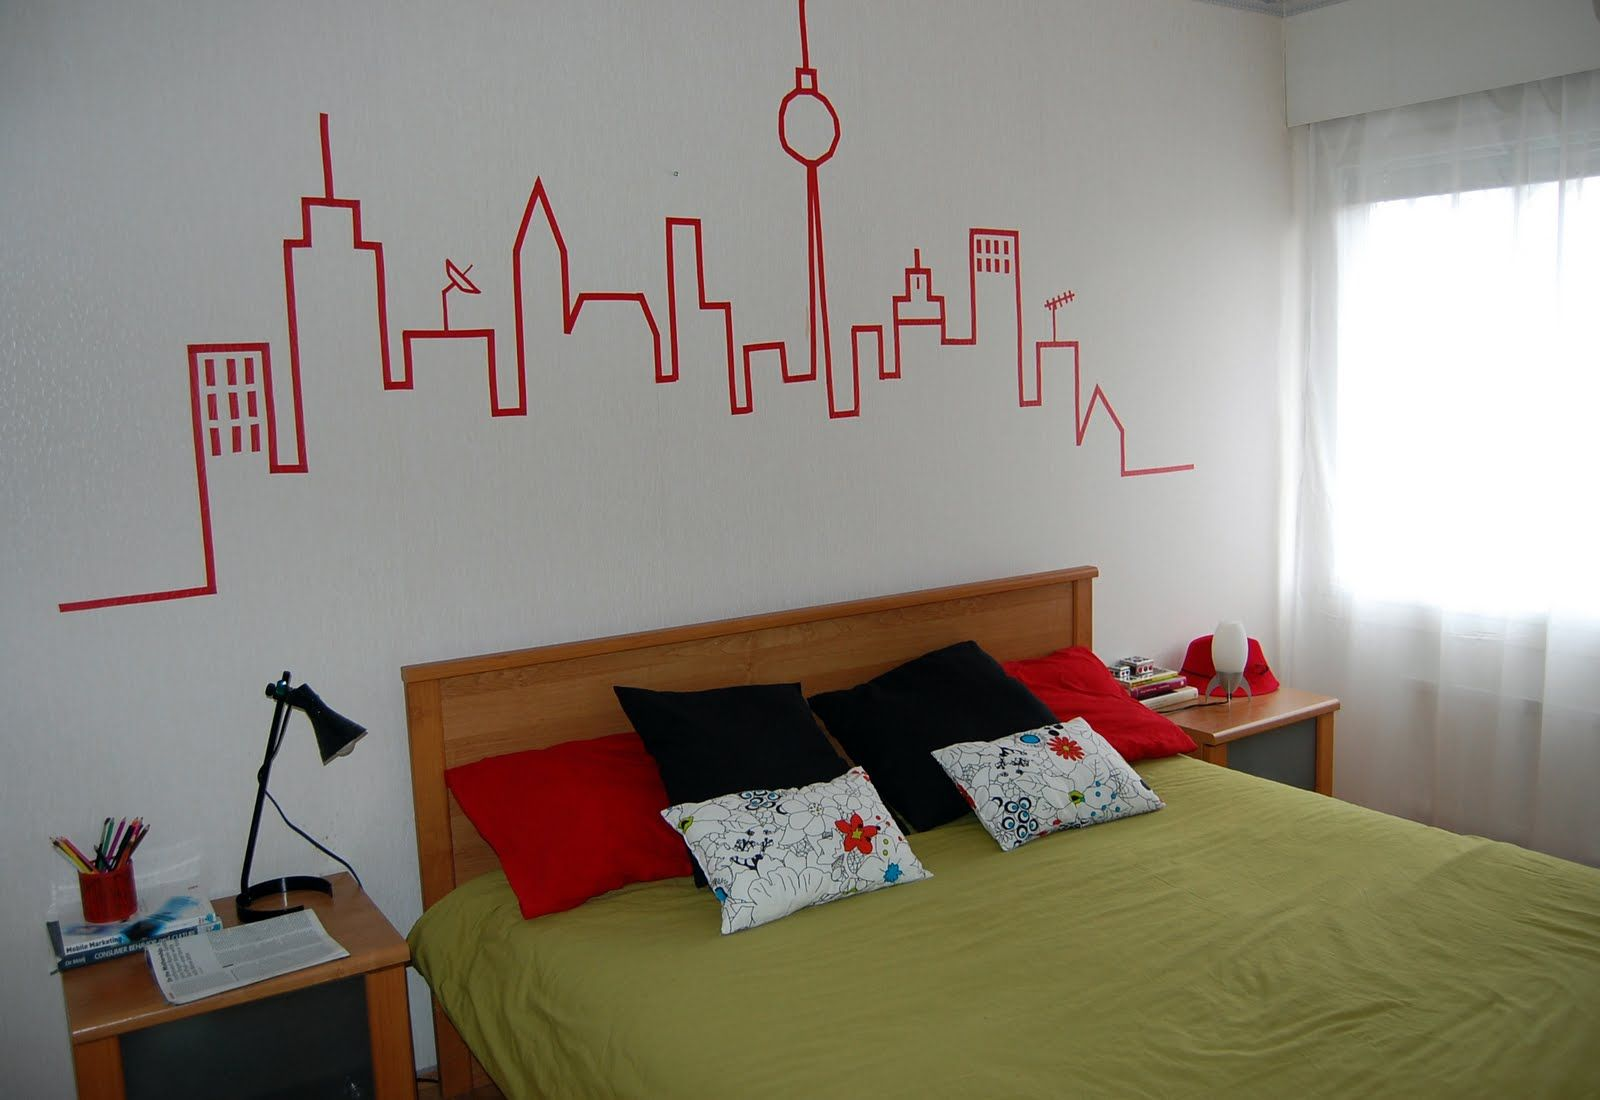 1600 1100 dibujos pinterest consejos - Consejos para pintar paredes ...